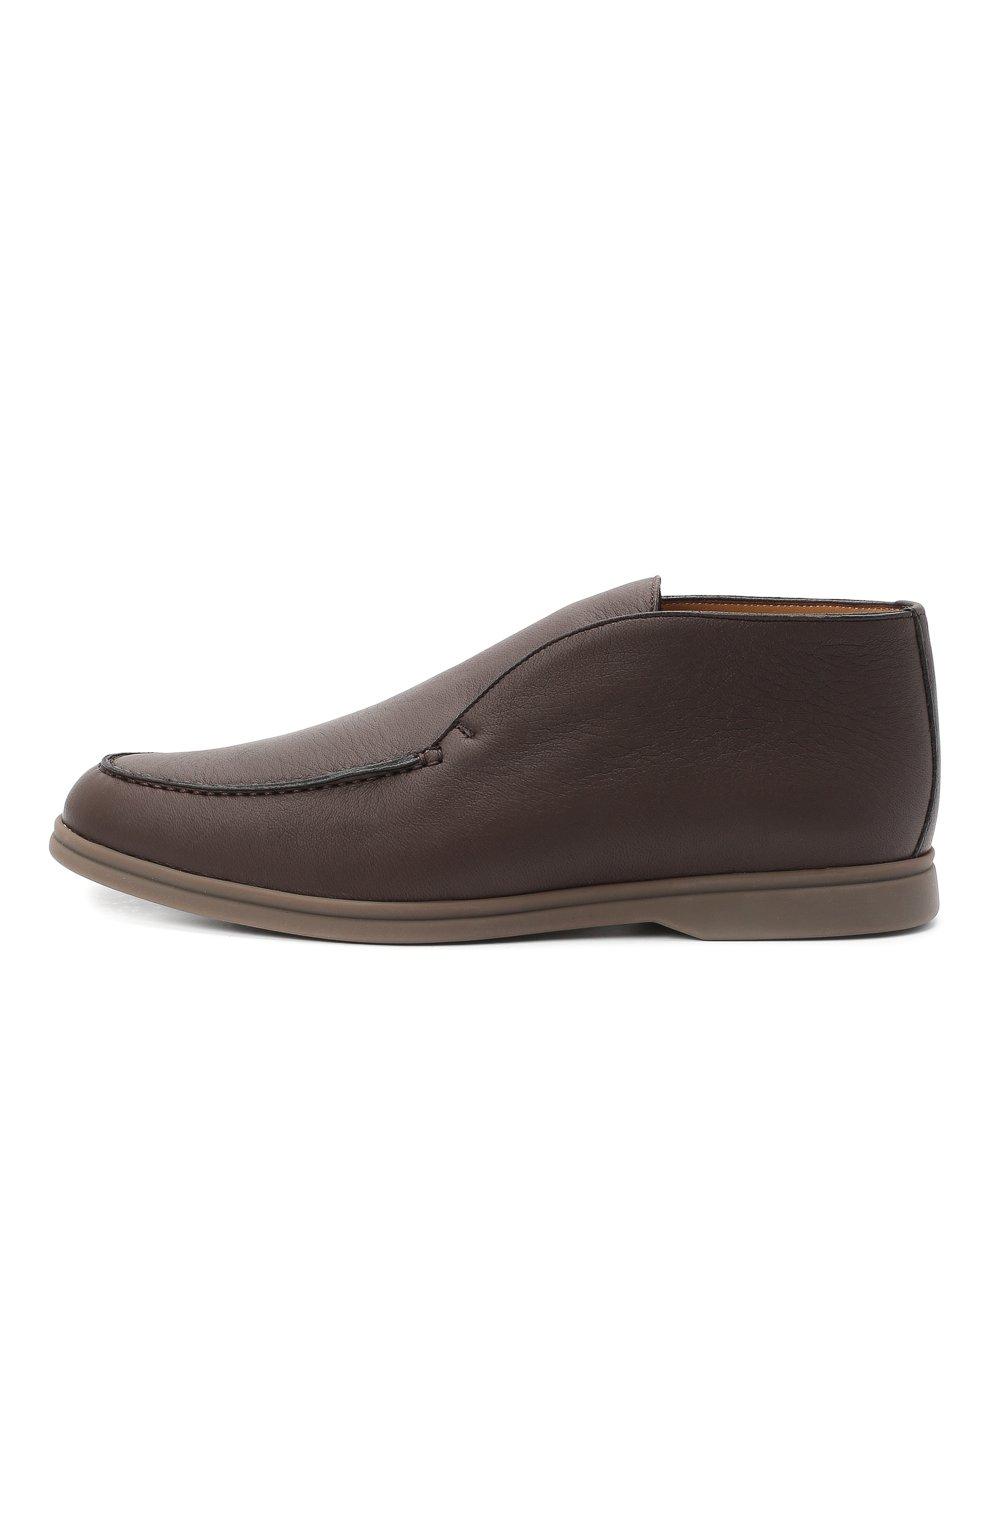 Мужские кожаные ботинки open walk LORO PIANA темно-коричневого цвета, арт. FAI3349 | Фото 3